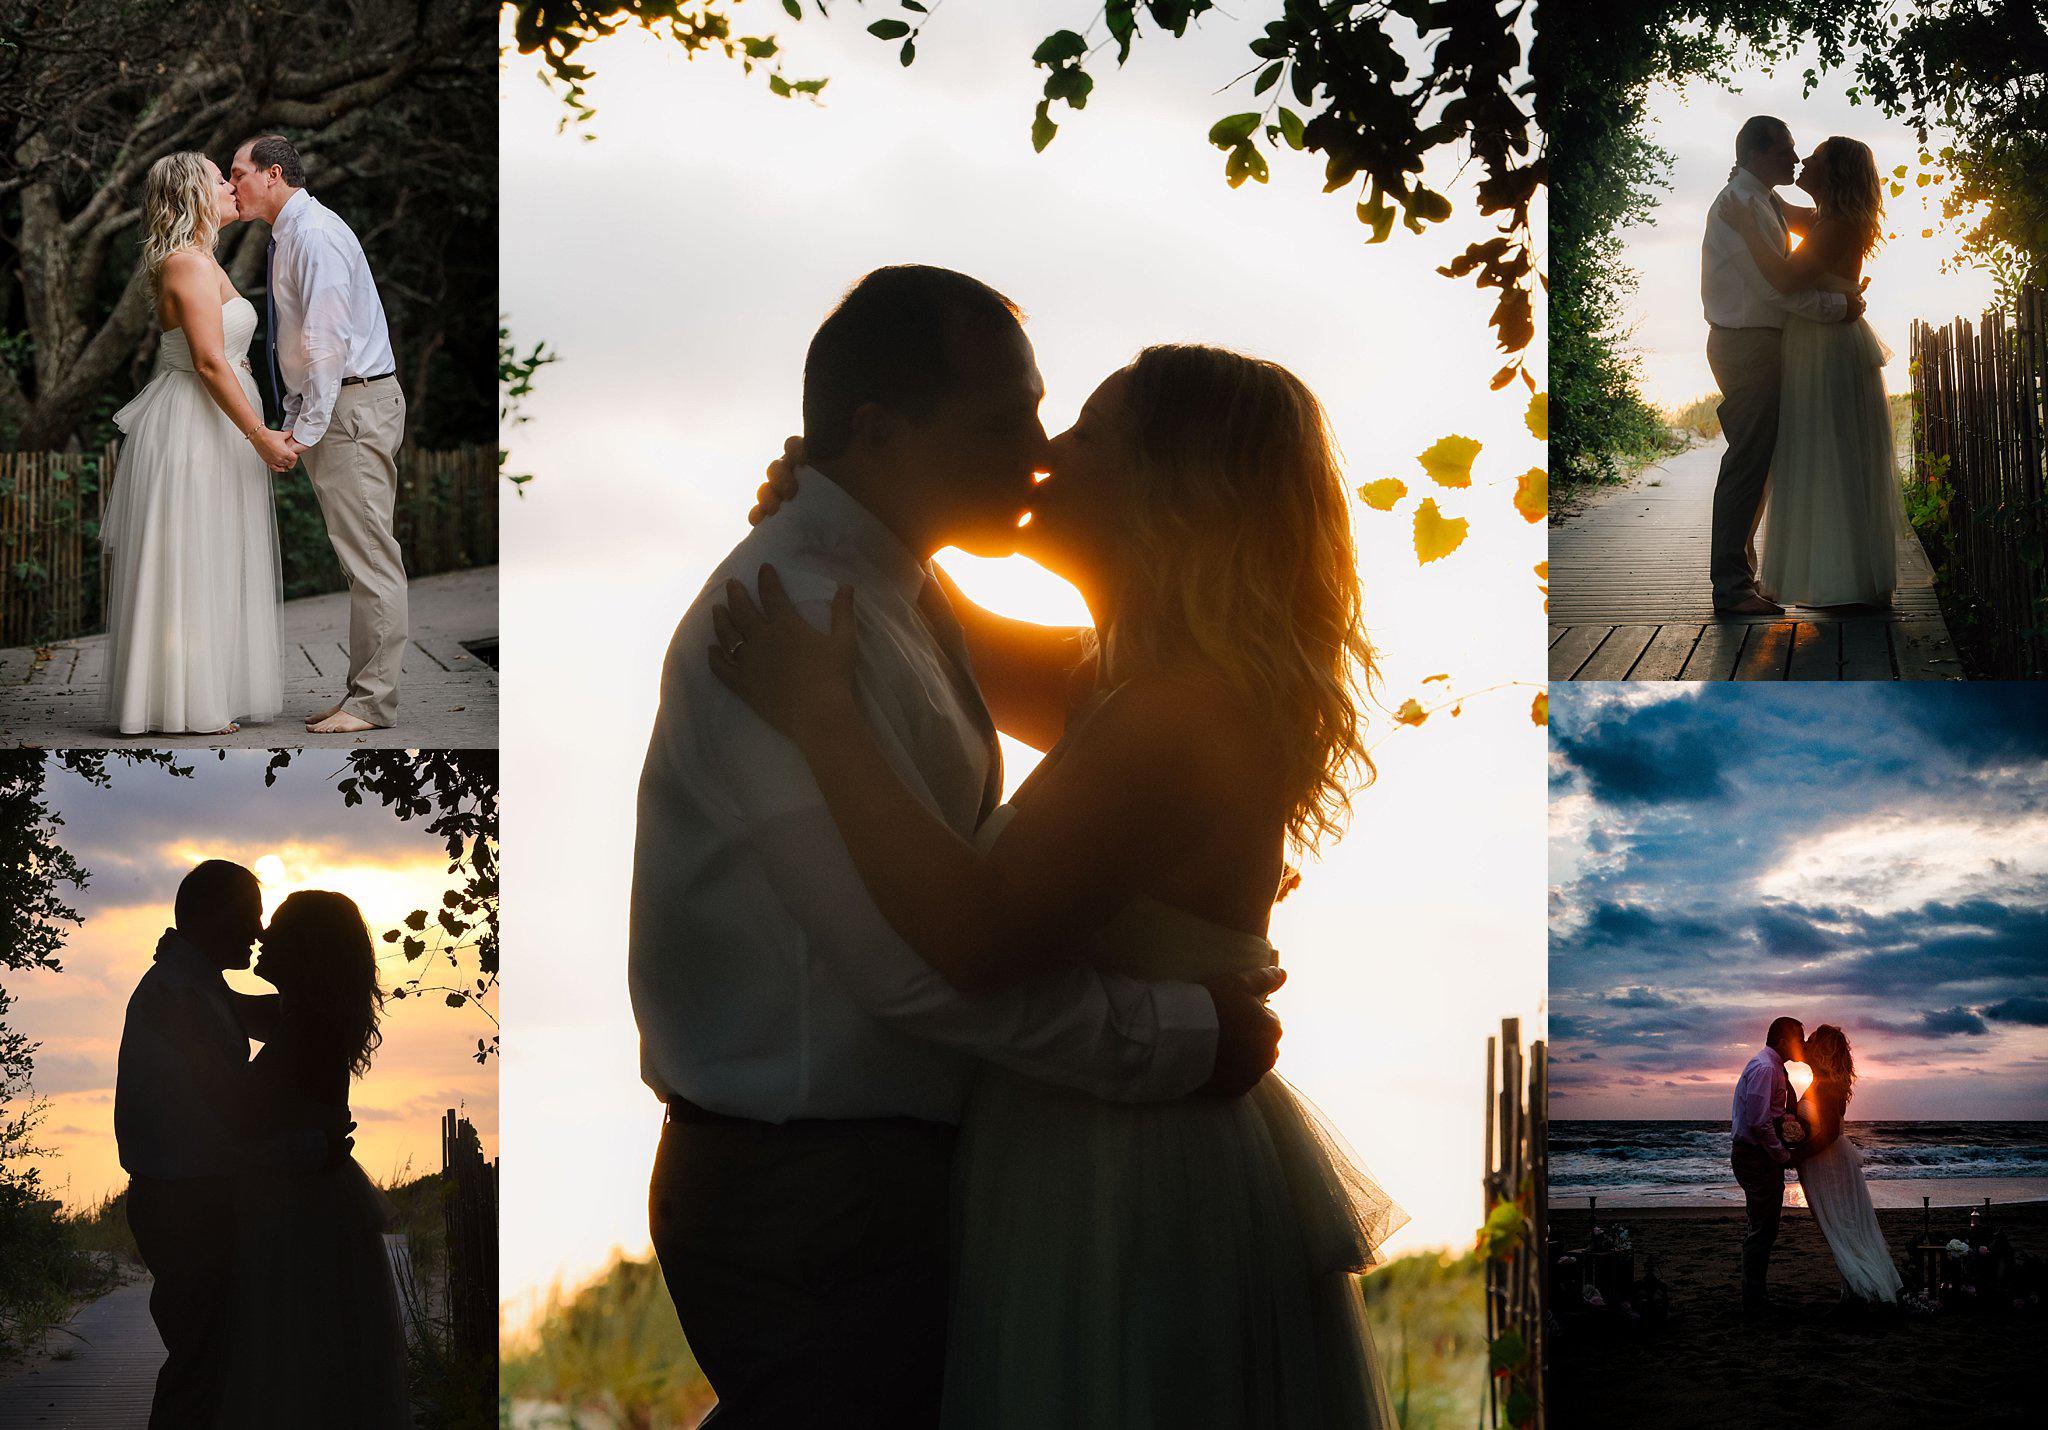 hampton-roads-wedding-elopement-photographer-virginia-beach-sunrise-ceremony-norfolk-chesapeake-williamsburg-wedding-photographers